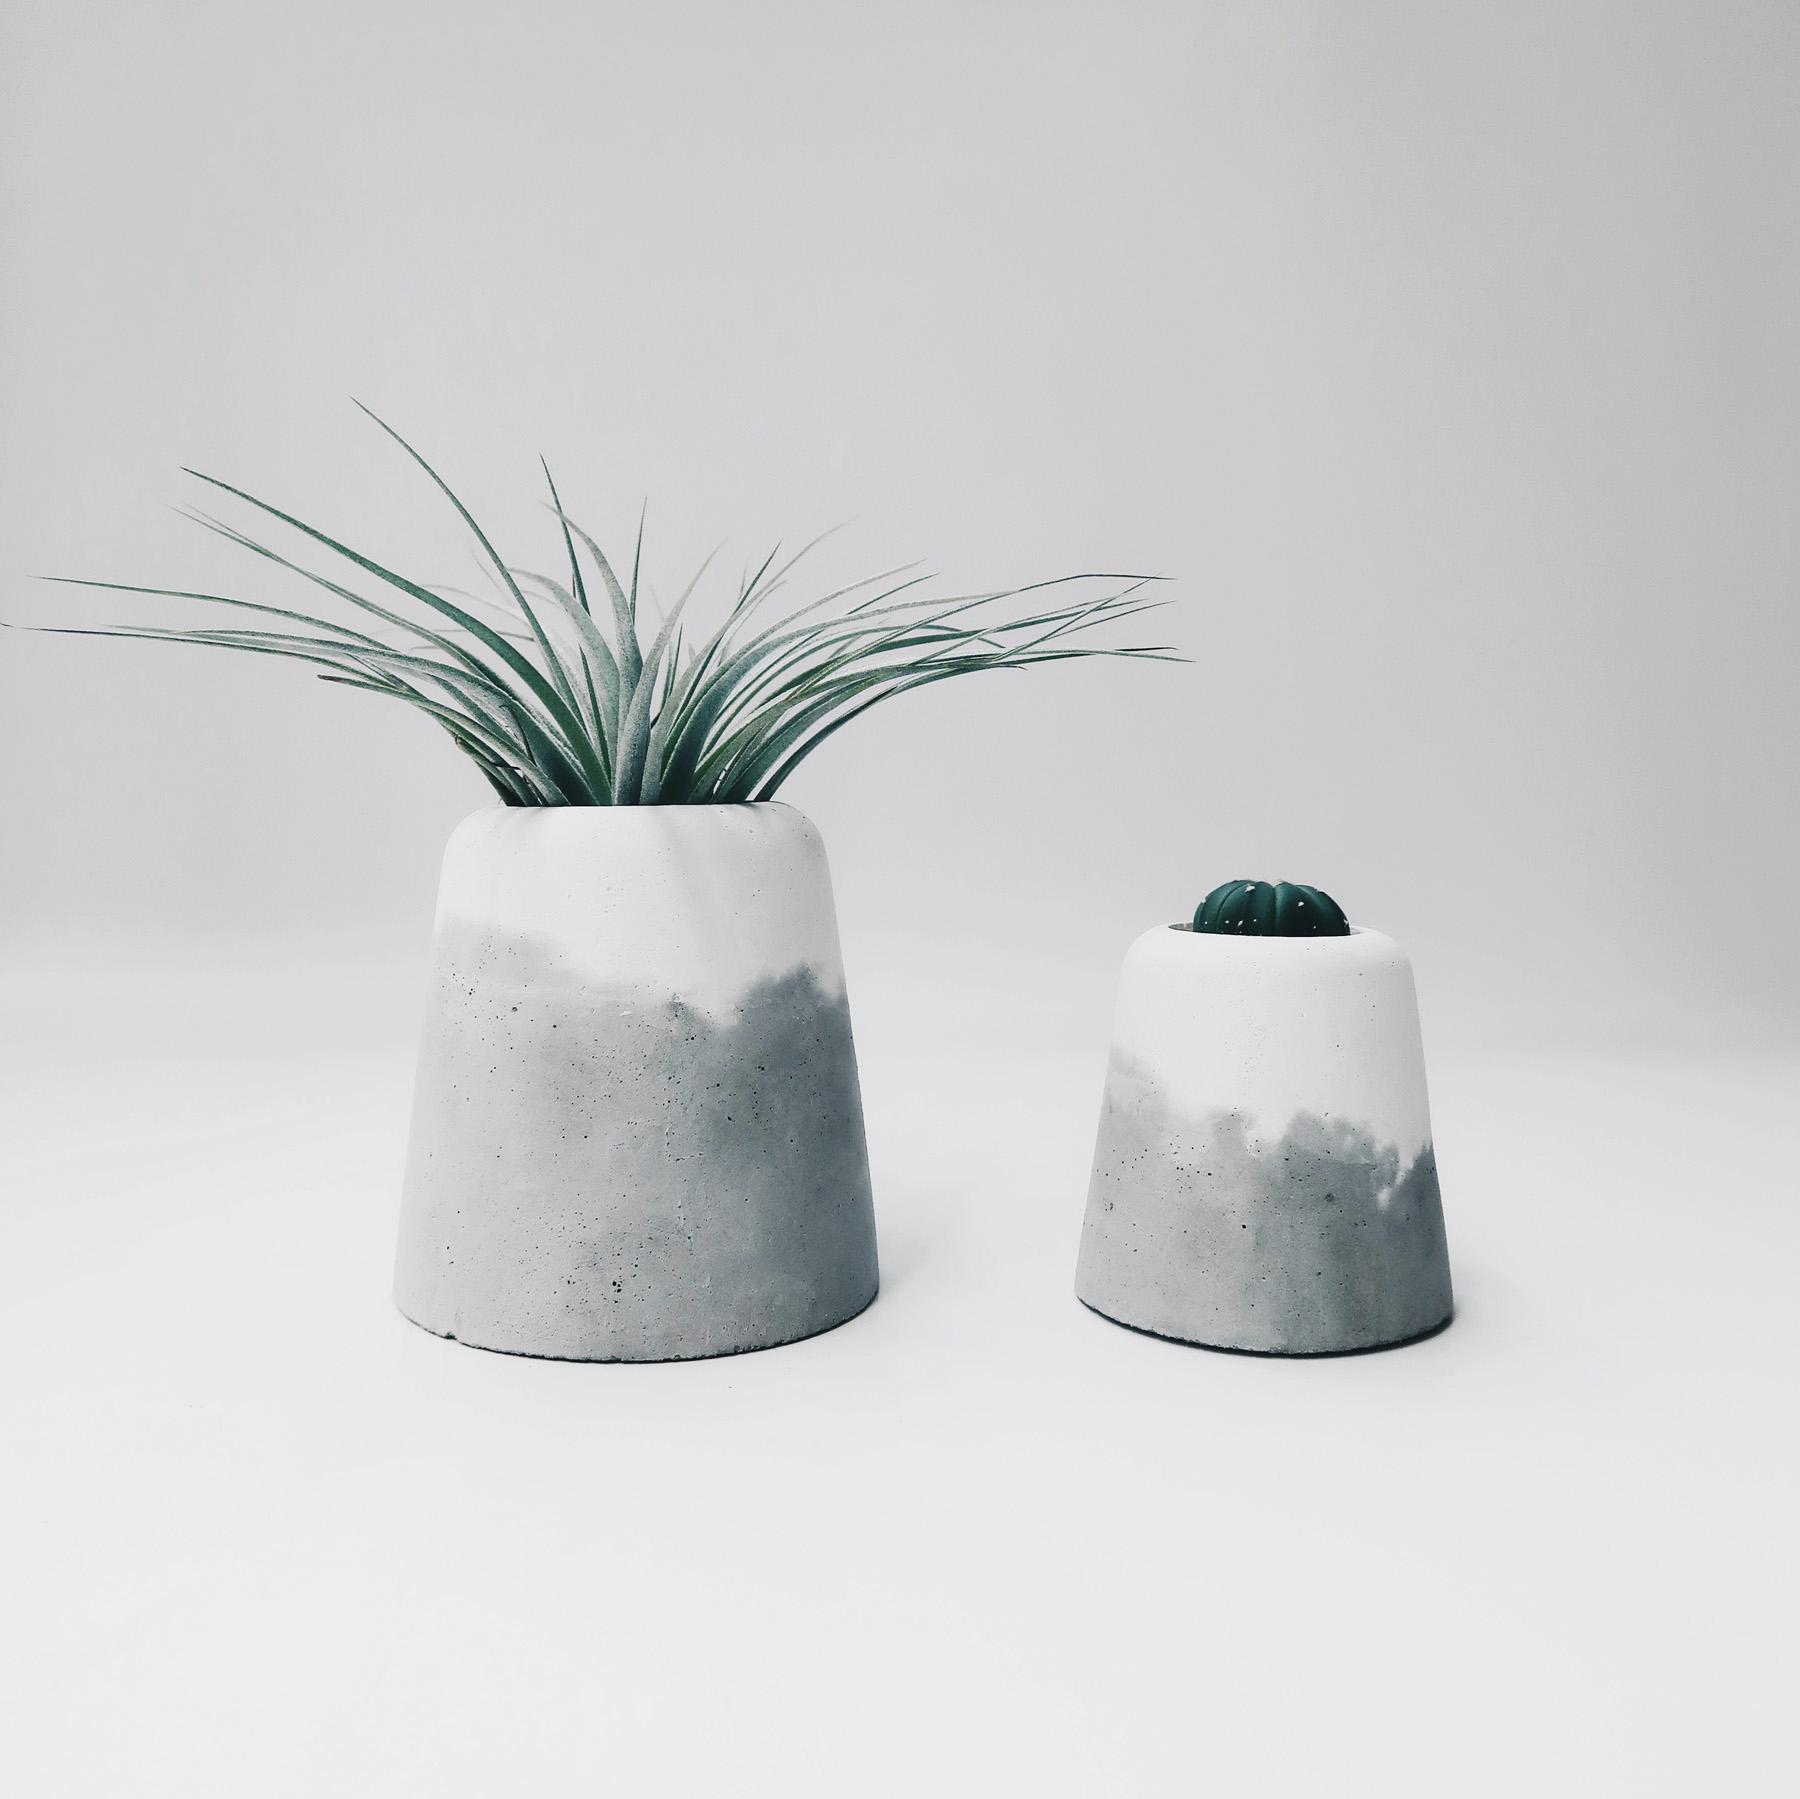 SNOW VOLCAN 雪火山多肉・仙人掌・空氣鳳梨水泥盆栽 / Succulent Concrete planter